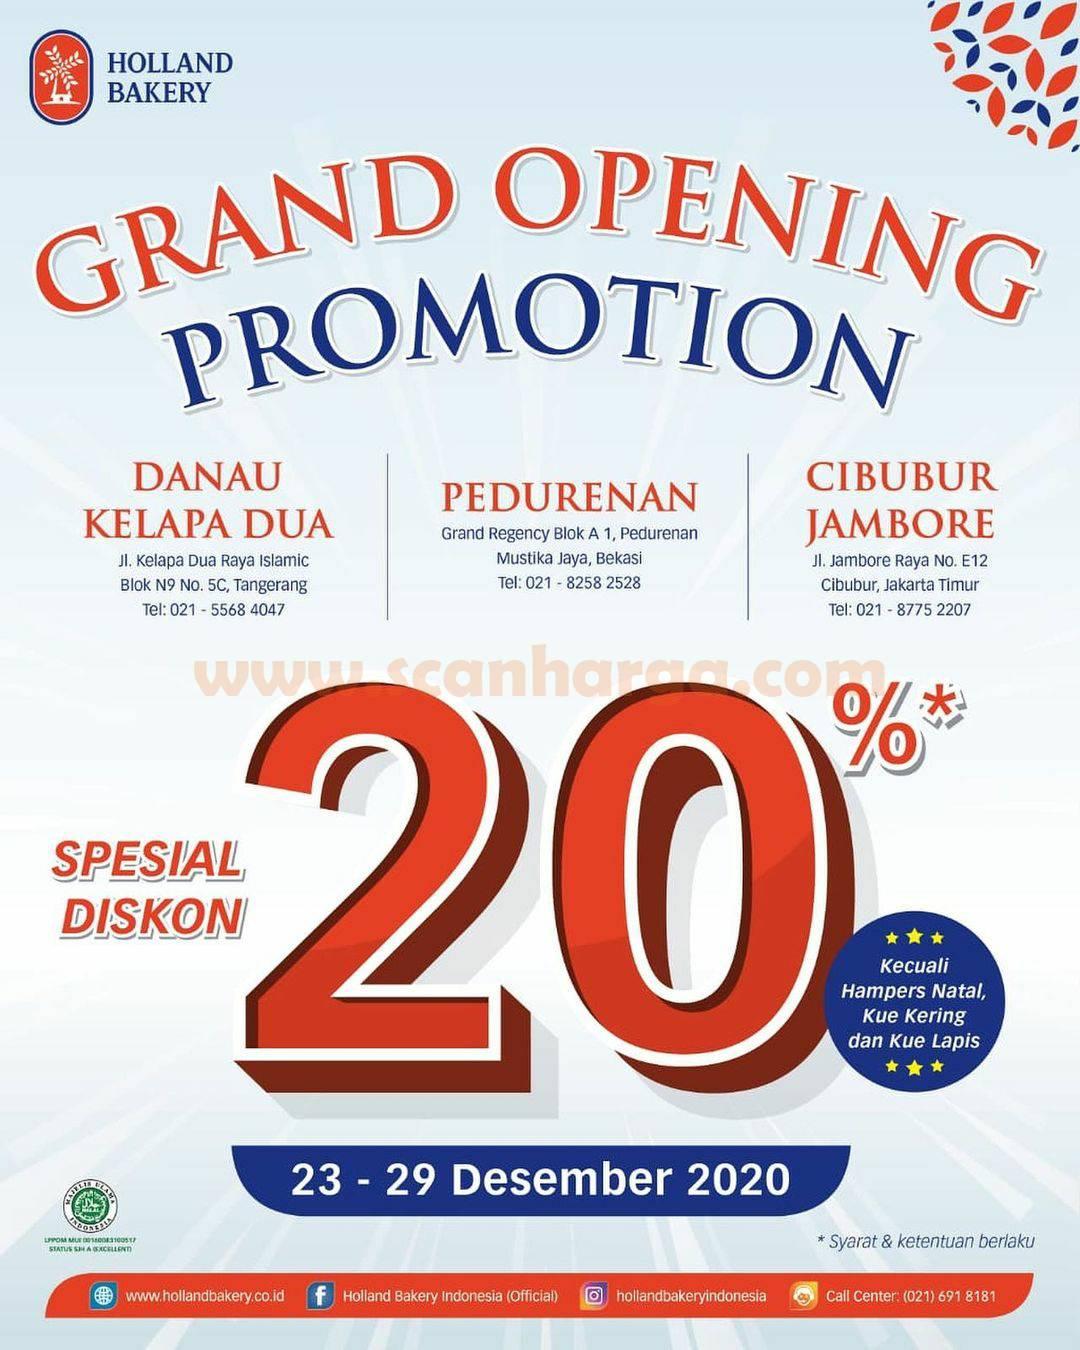 Holland Bakery Danau Kelapa Dua, Pedurenan & Cibubur Jambore Opening Promo Diskon 20%